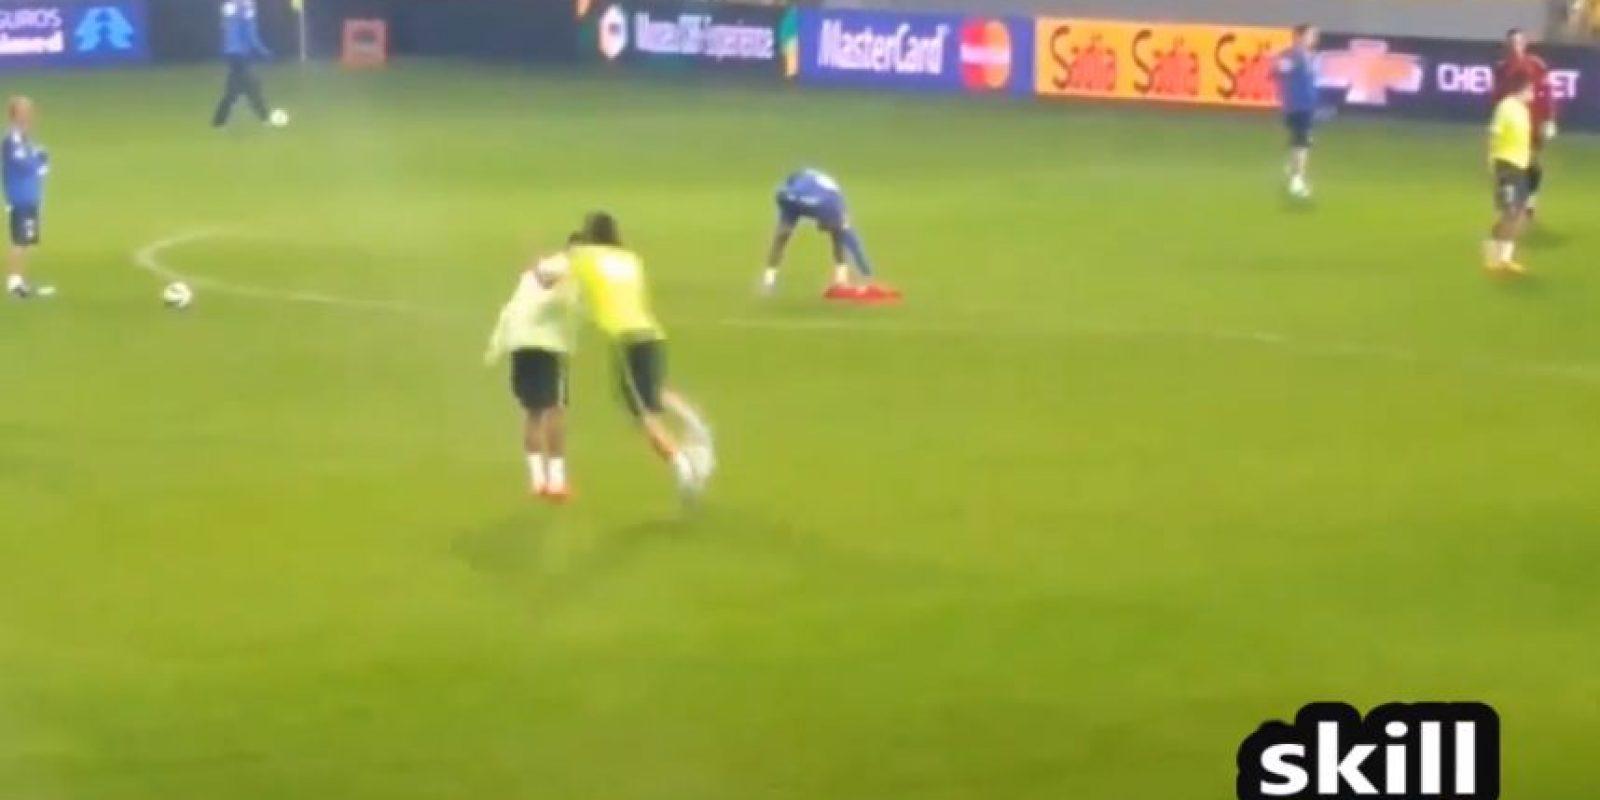 Filipe Luis le quitó el balón Foto:Youtibe: Brazil FIFA Cup